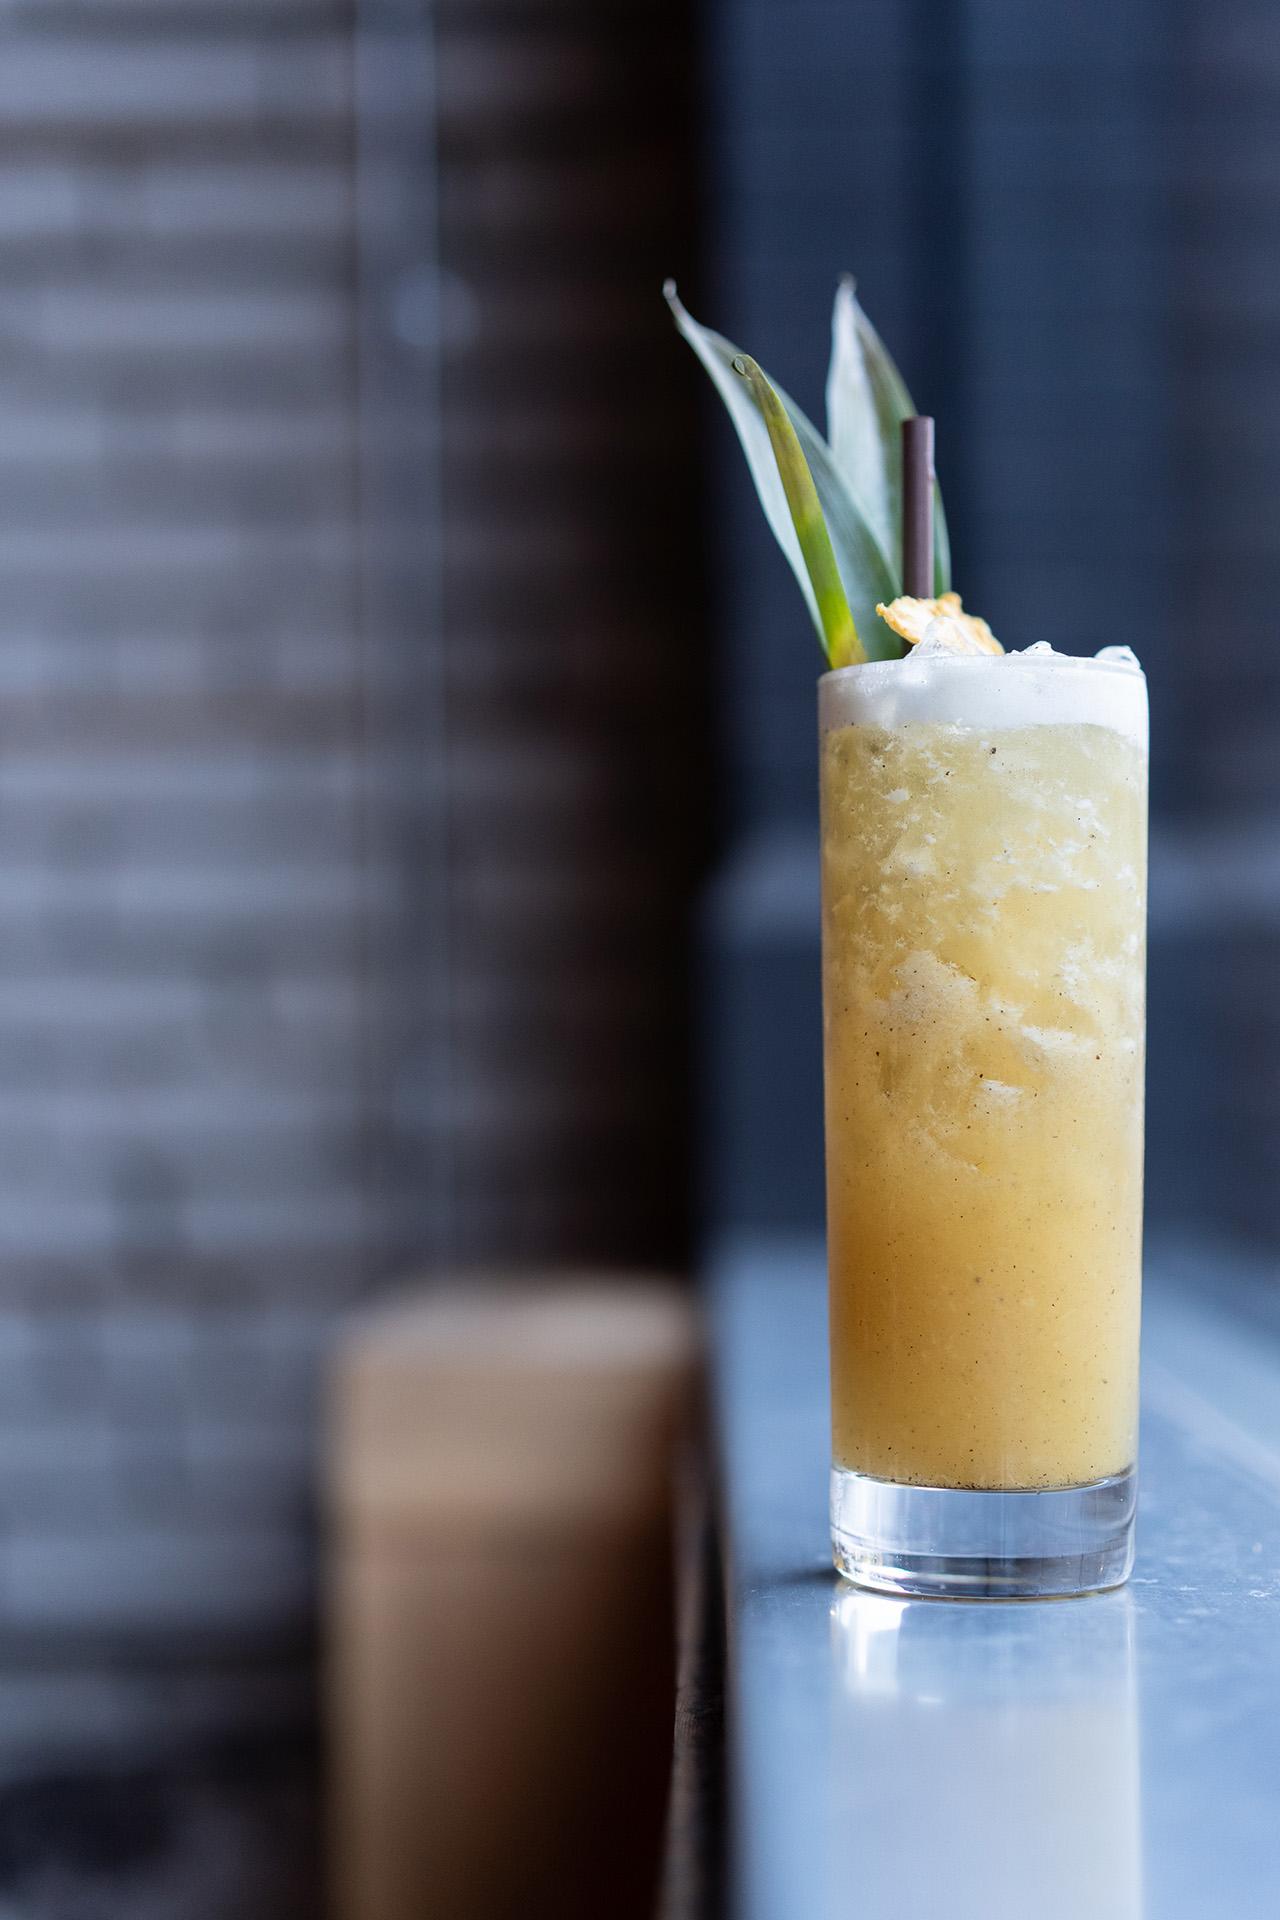 Pina Borracha: Havana 3yr rum, Wray & Nephew rum, grilled pineapple juice, vanilla syrup, lemon and soda.